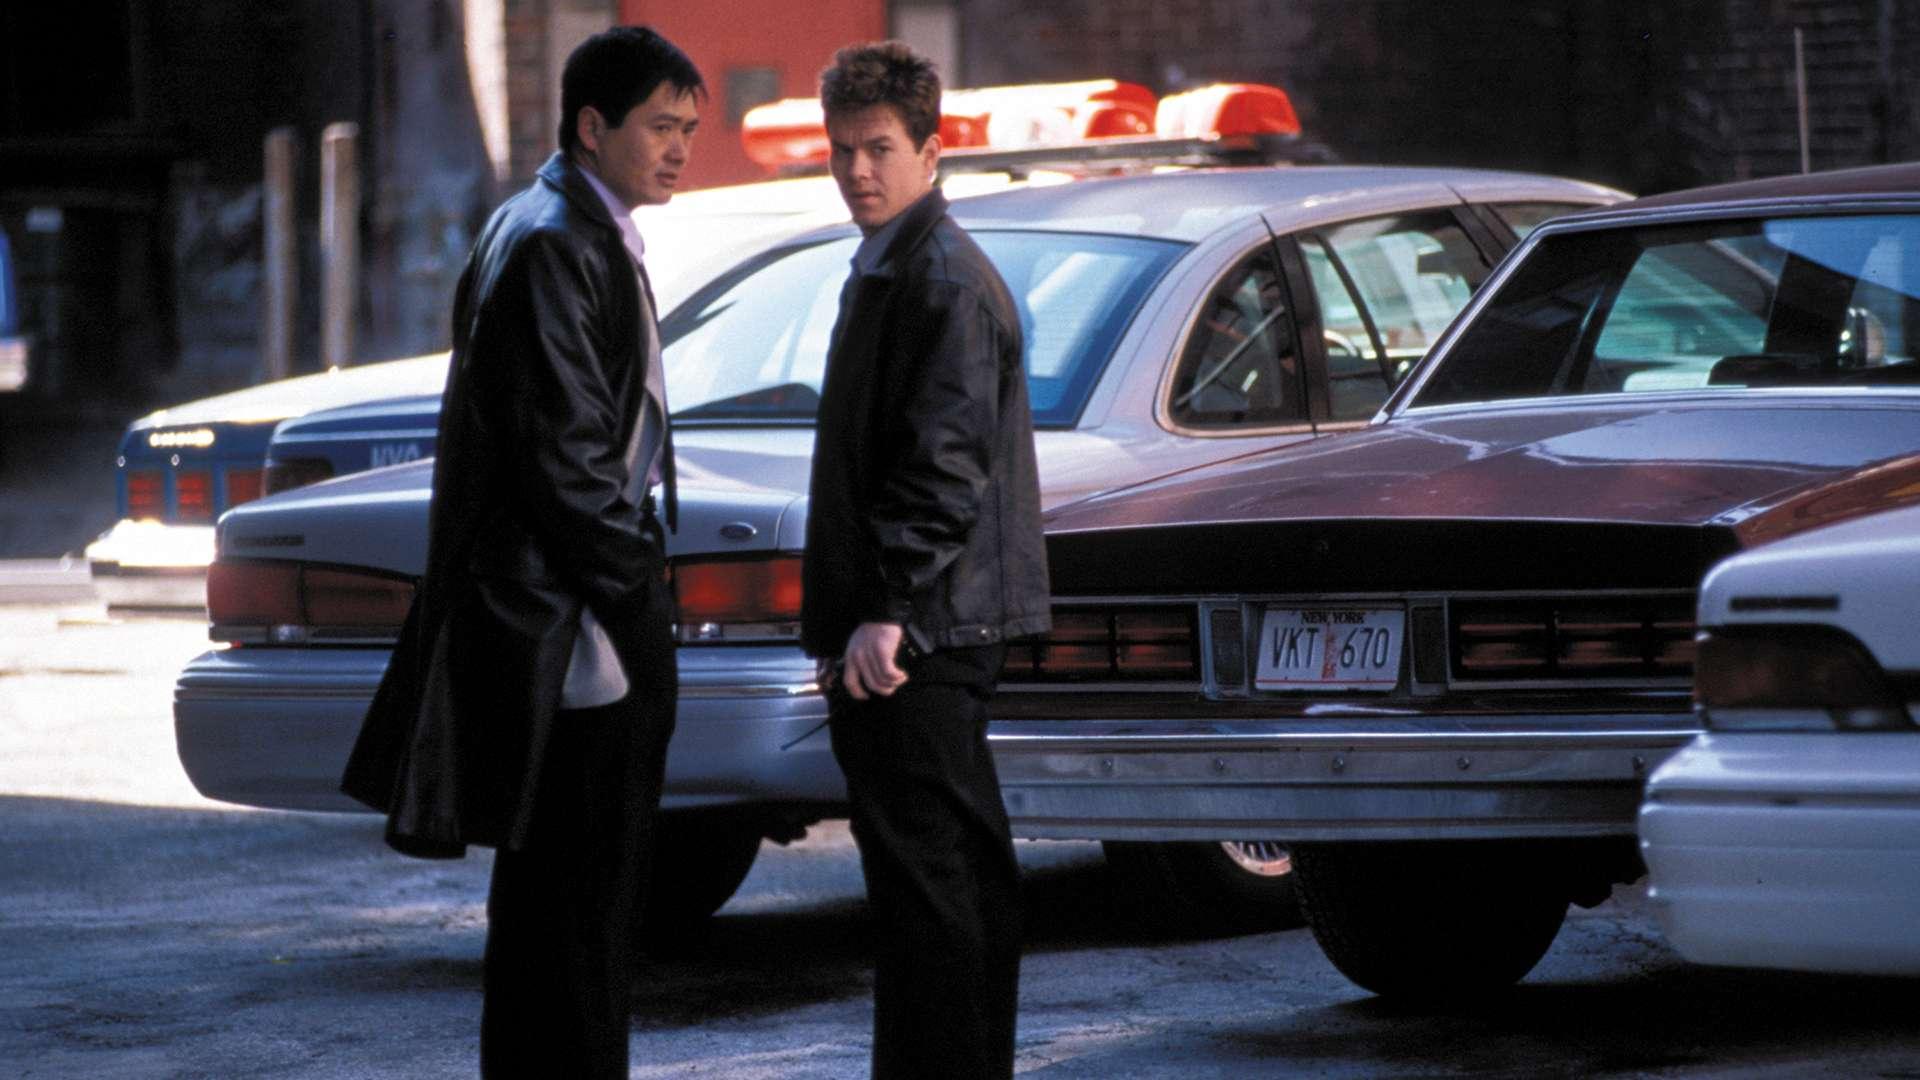 NYPD15分署